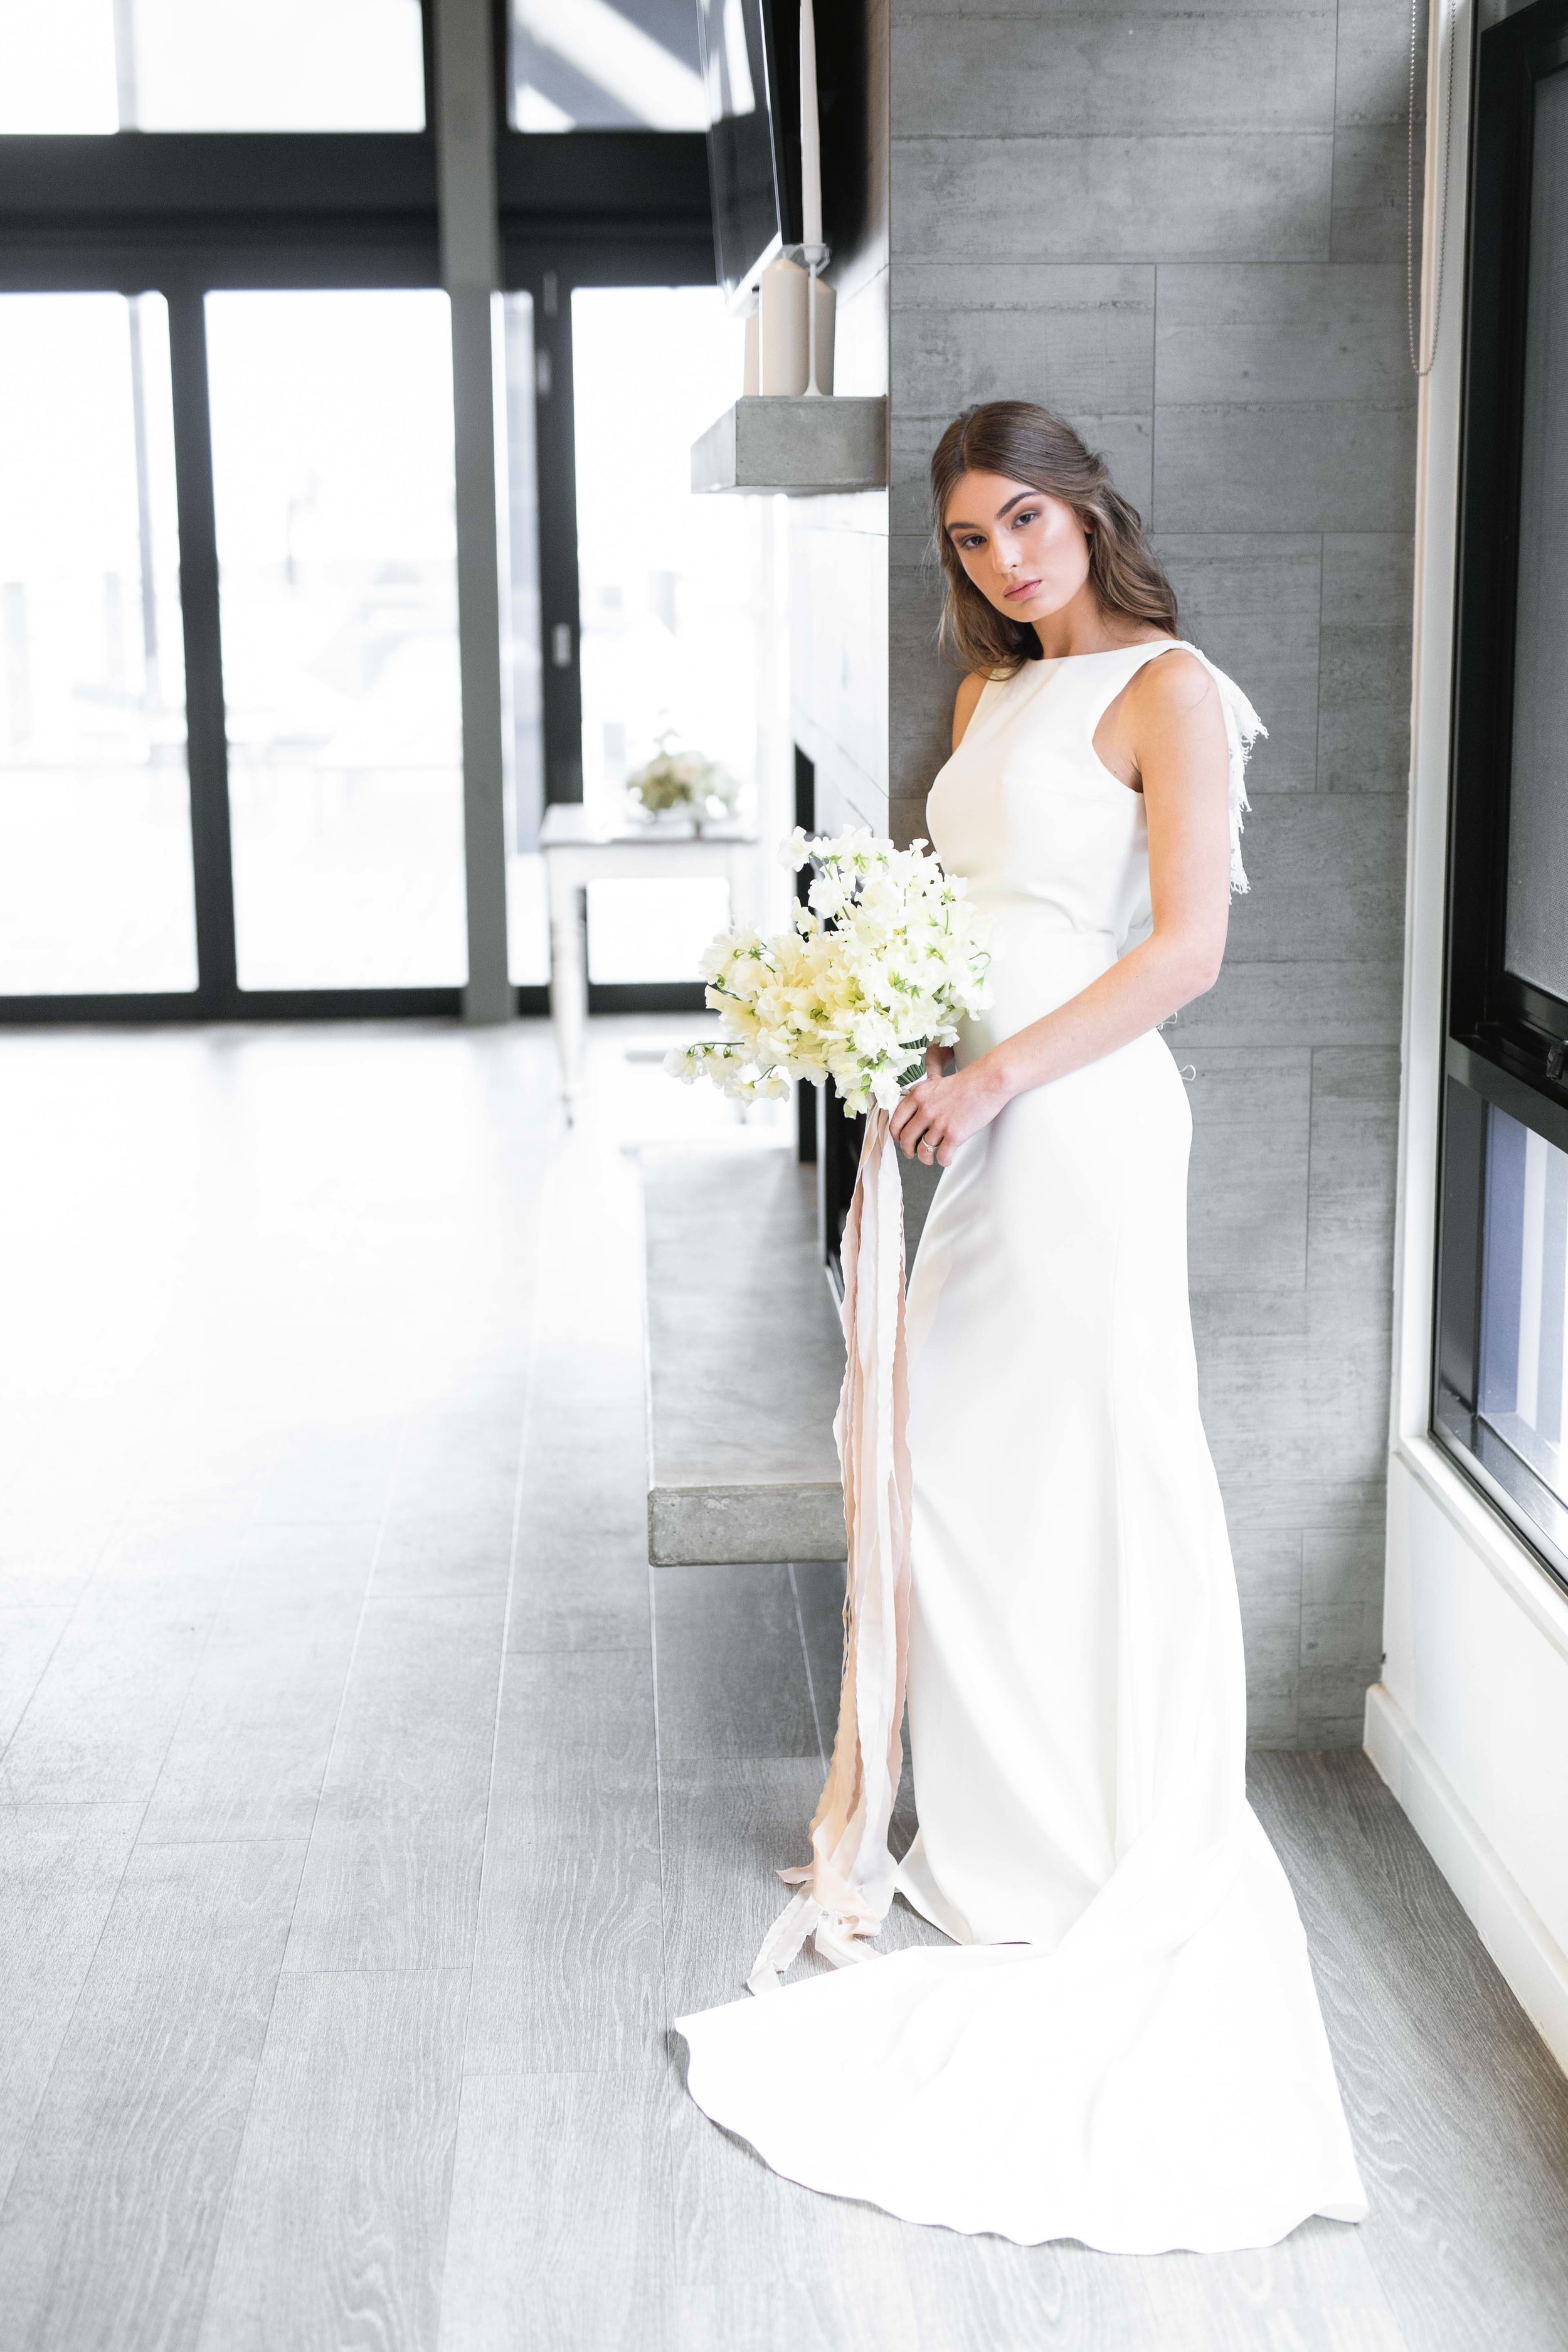 Fremantle Wedding Walk - Blue HQ, Perth Wedding Venue -  Tessa Kit Photography -JQ9A8653.jpg